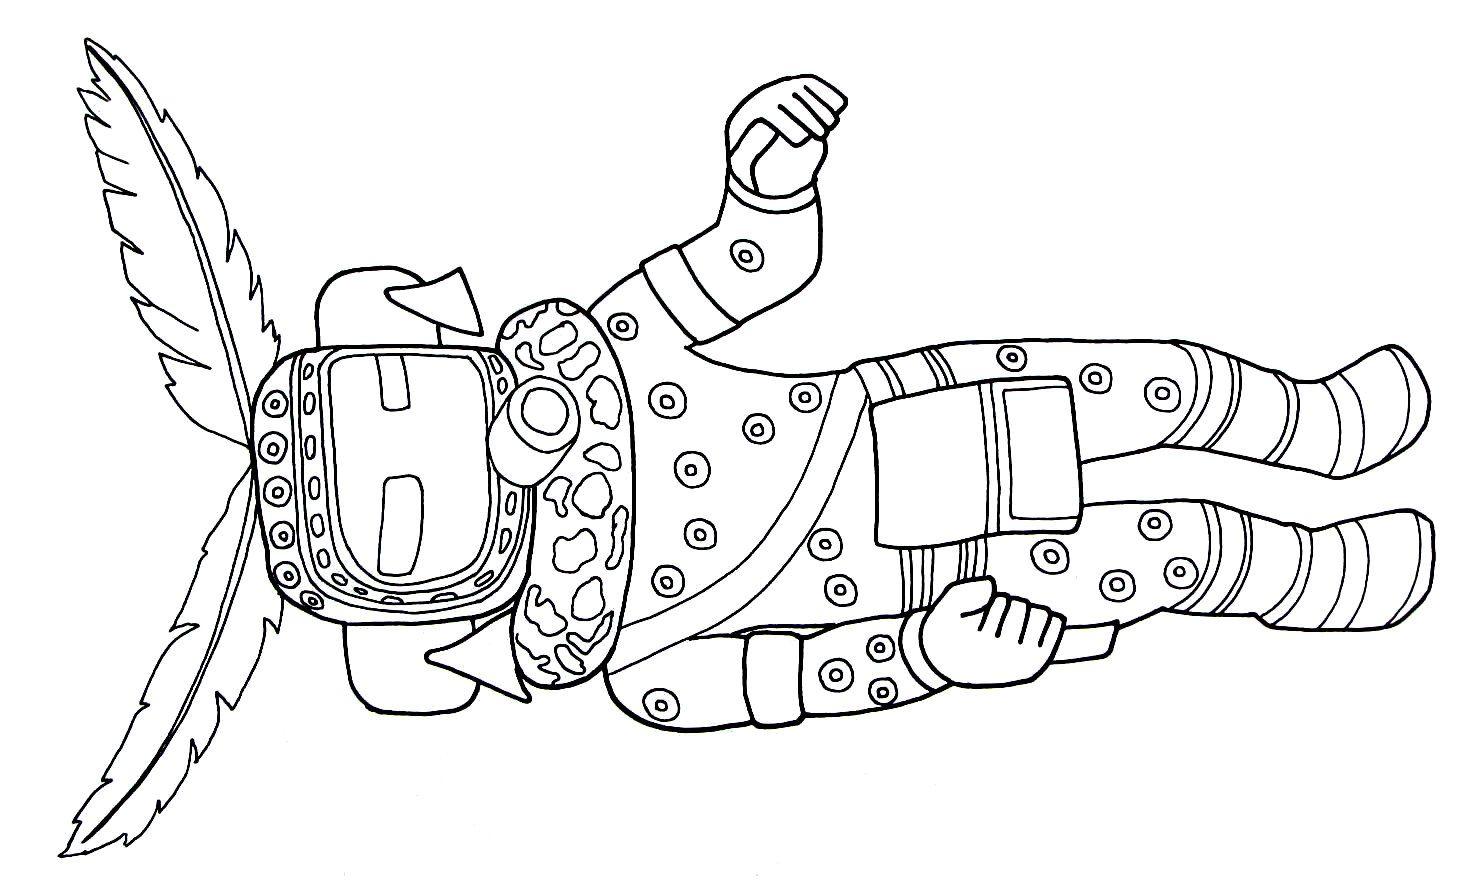 Kachina Doll Representing Avatshoya From The Hopi Indians